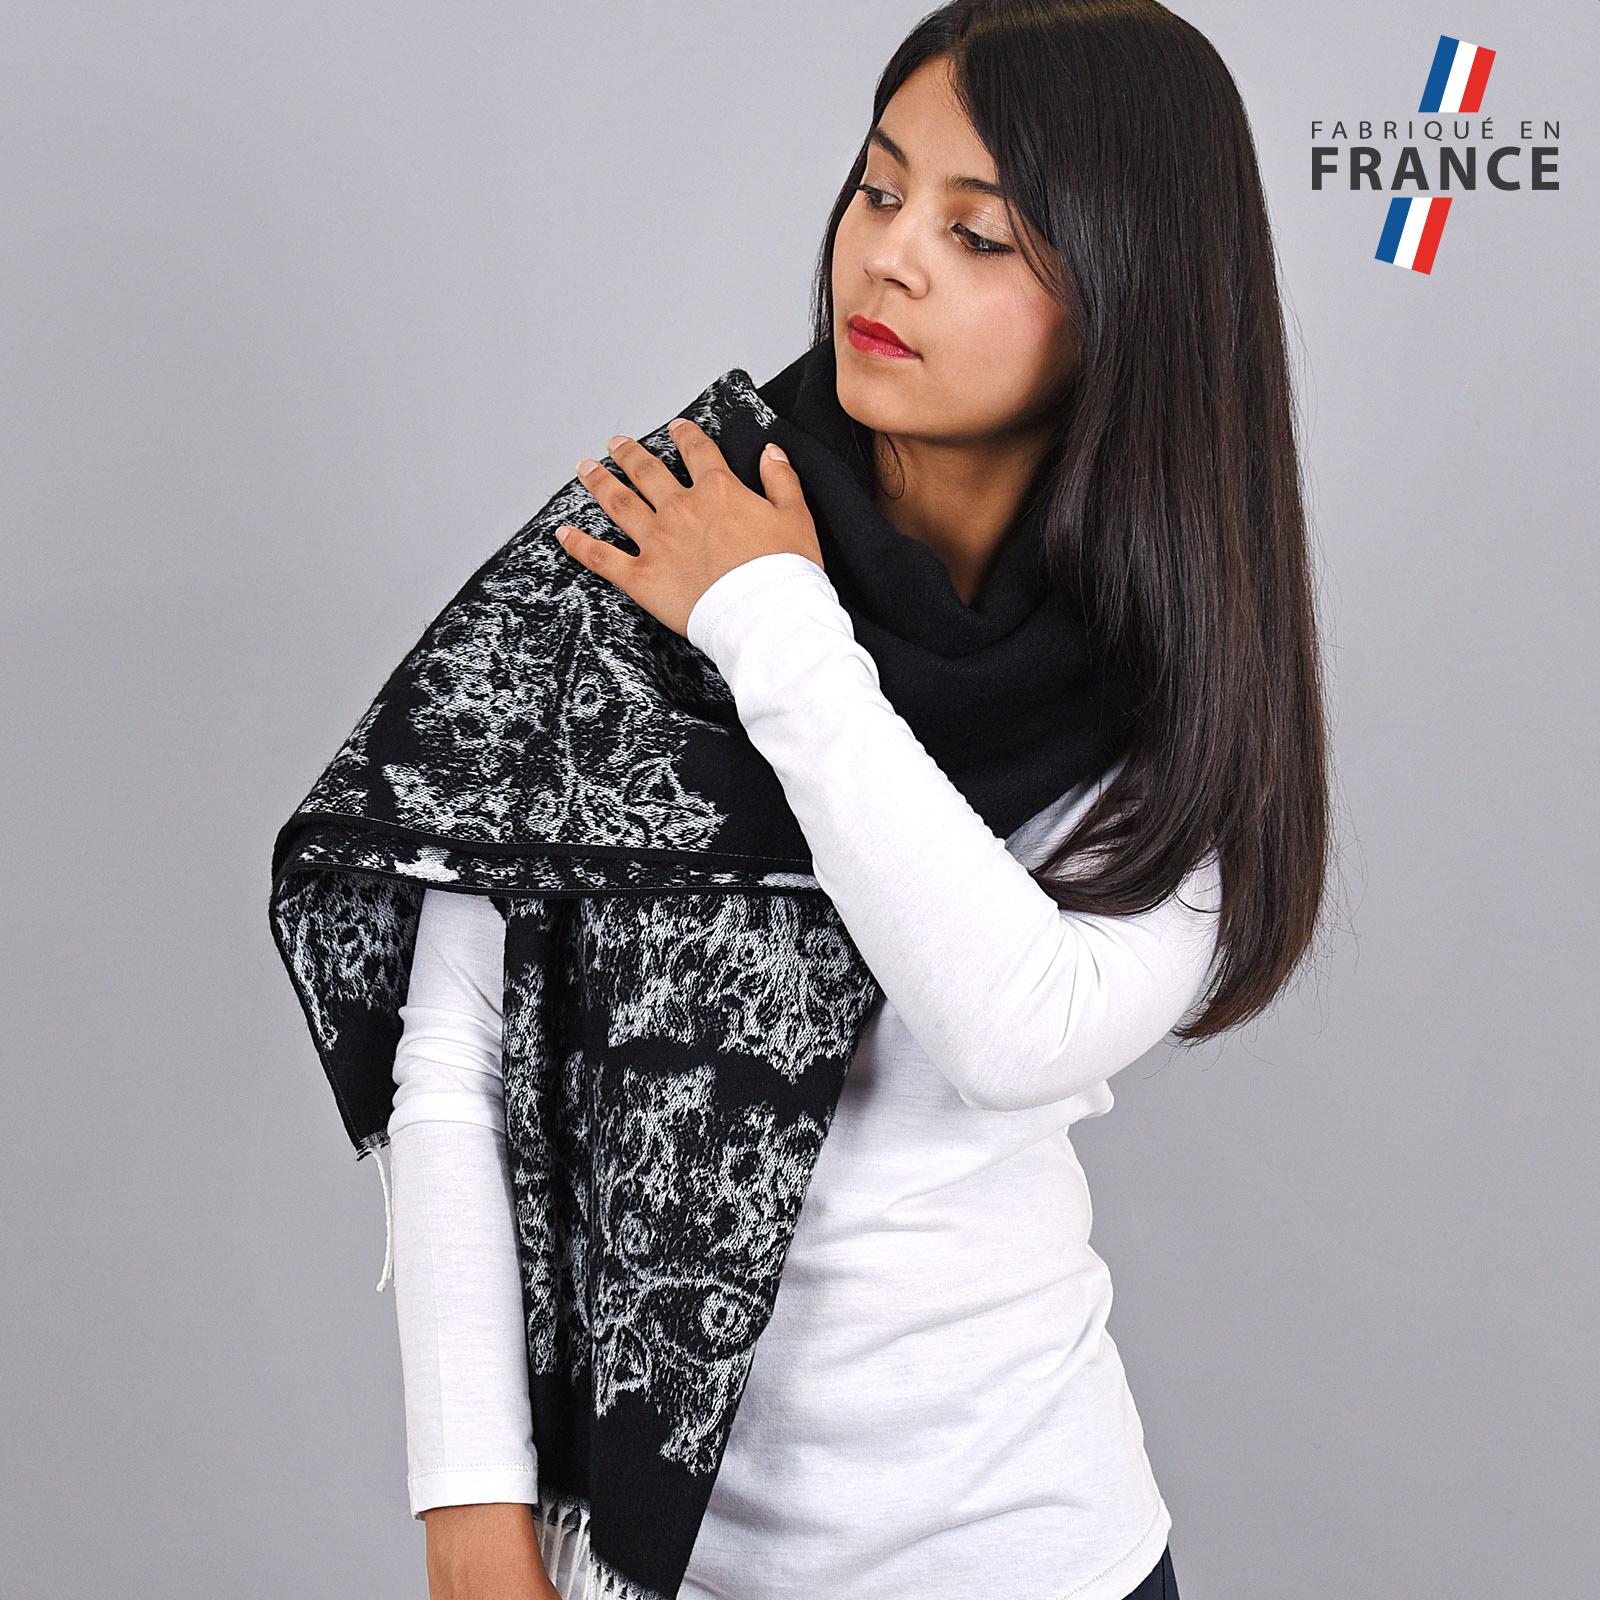 AT-03956-VF16-1-FR-chael-femme-noire